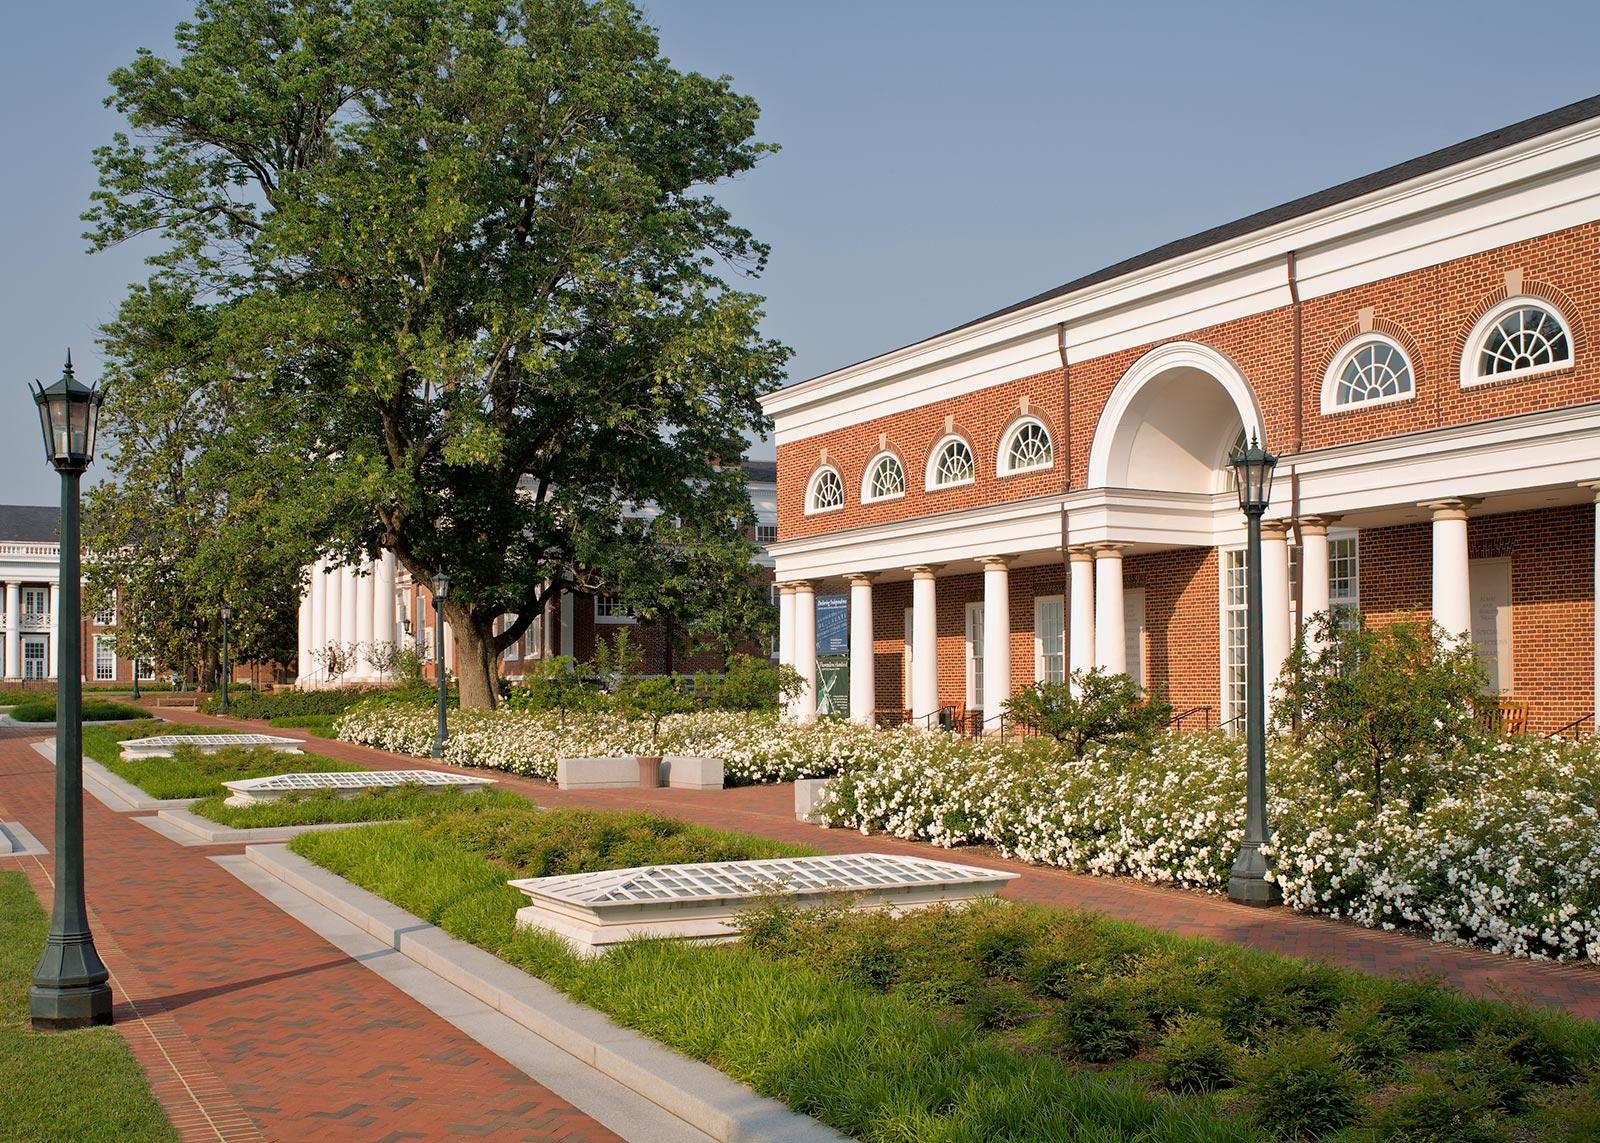 Alderman Quad at UVA. VA - OvS | Landscape Architecture